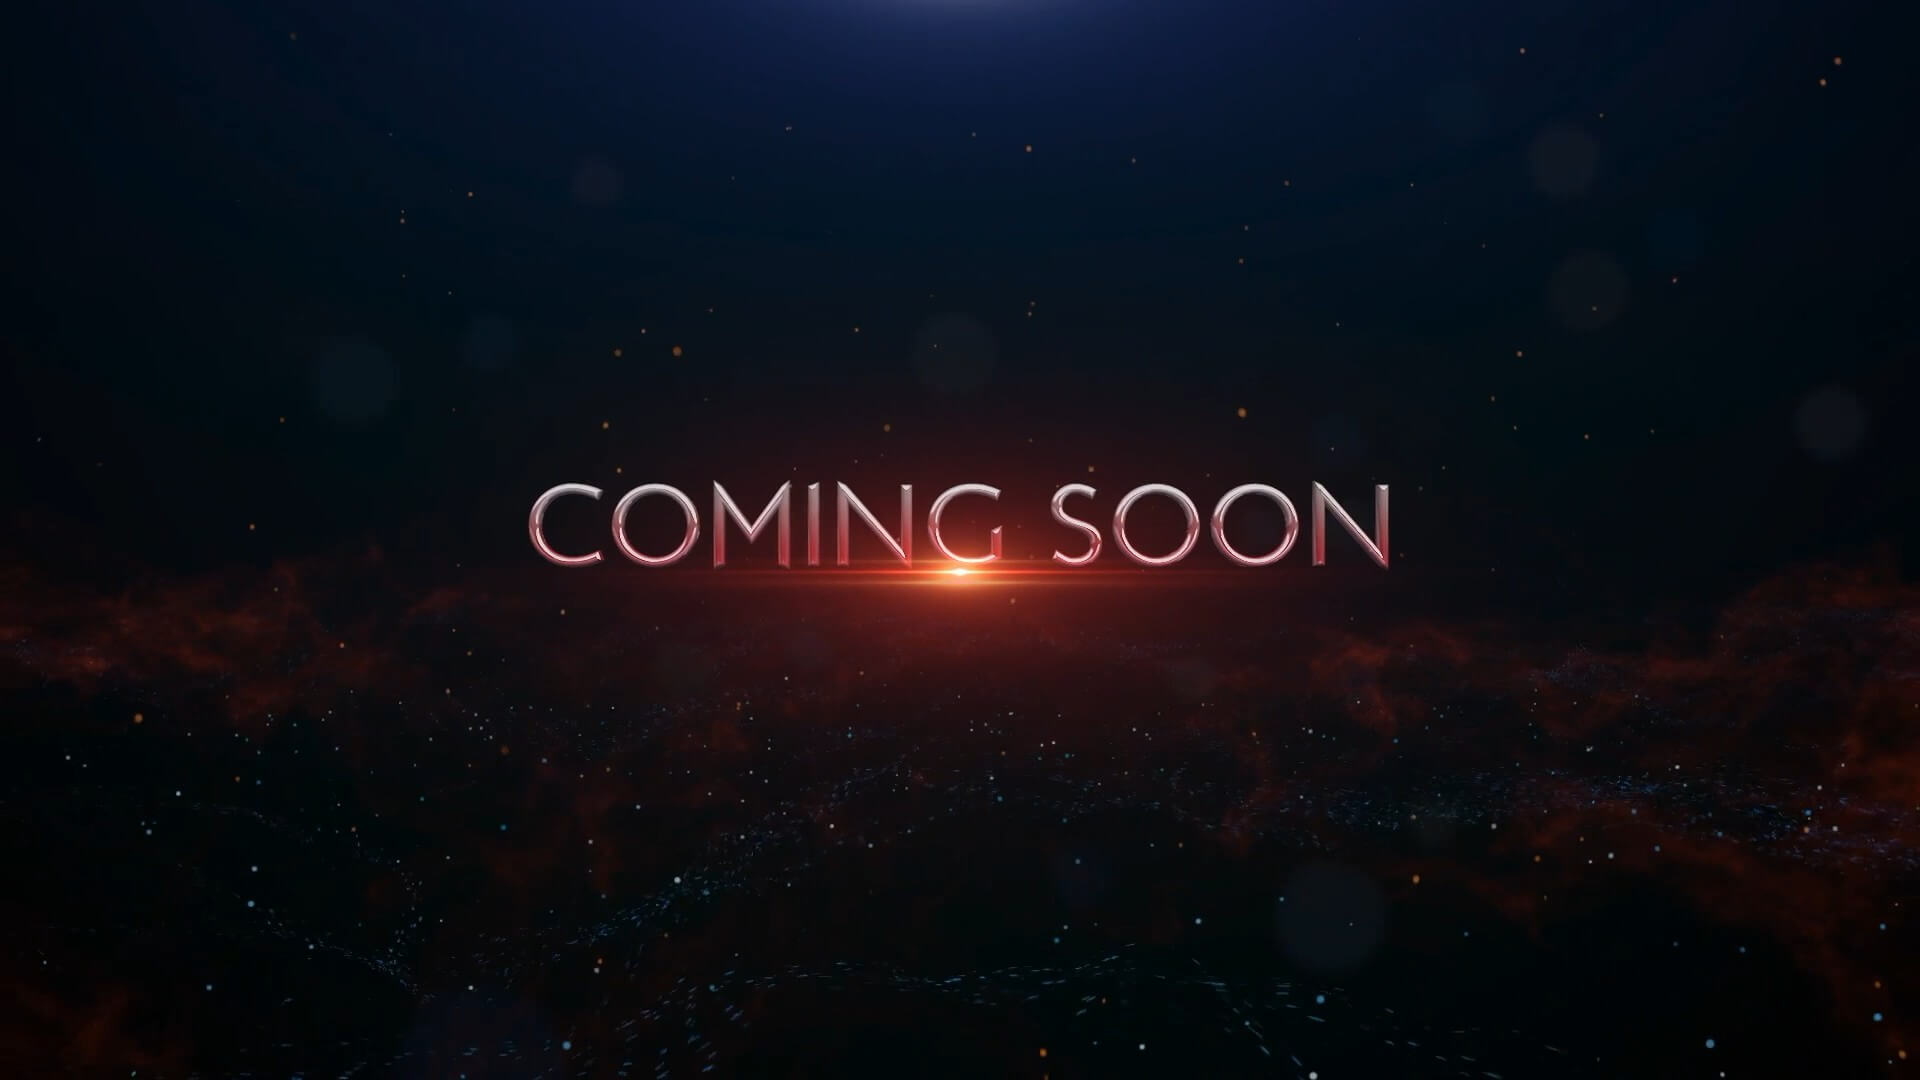 fcpx主题模板 震撼电影预告片标题模板 Cinematic Trailer Titles